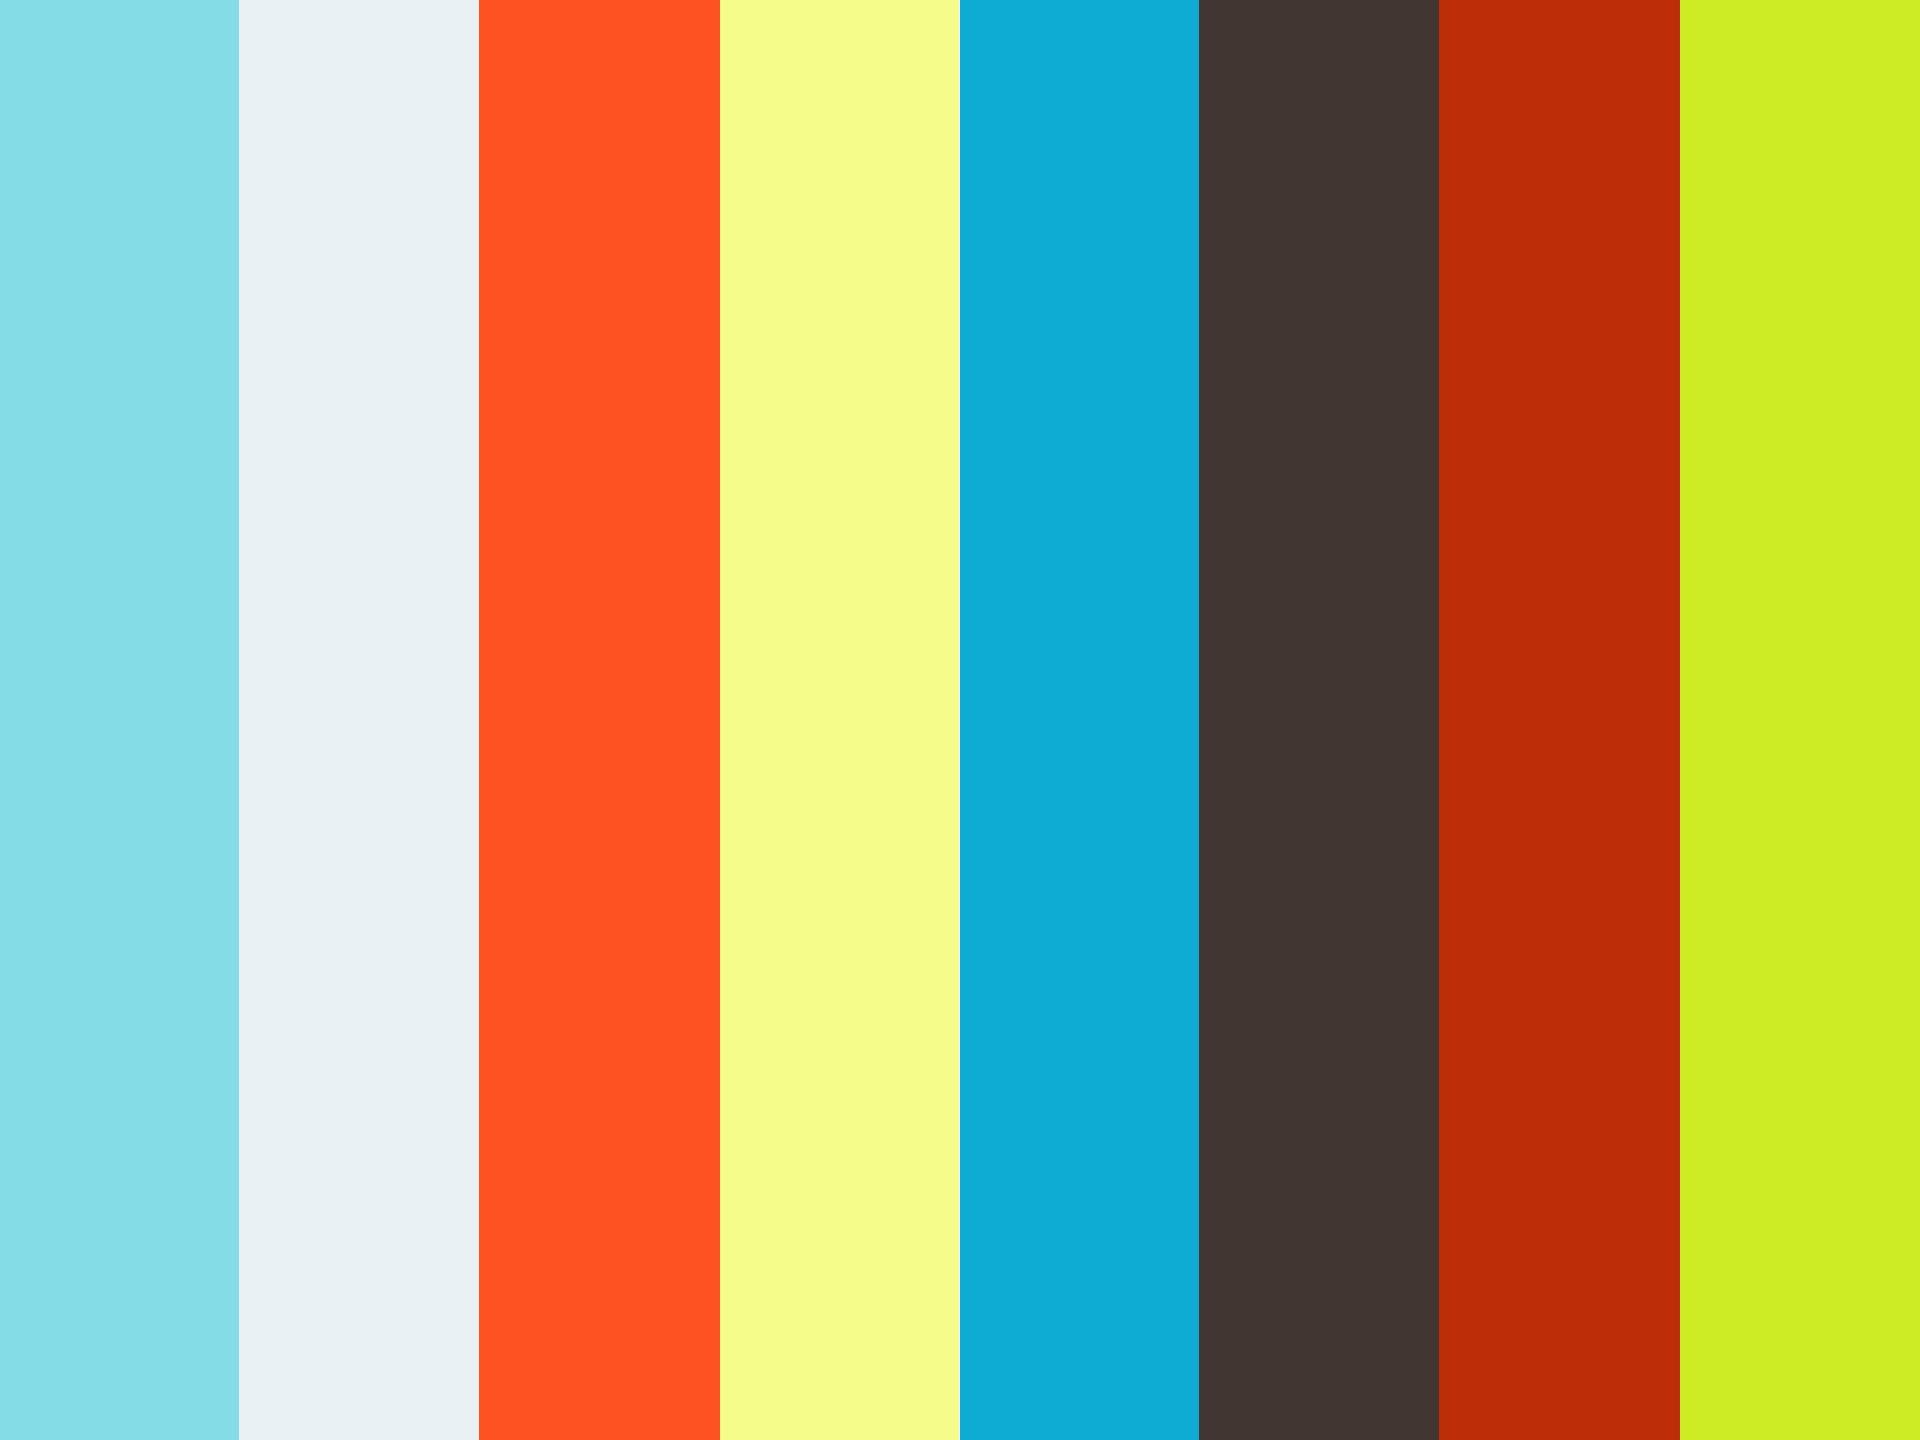 Hvordan installere du WordPress på eget domæne on Vimeo